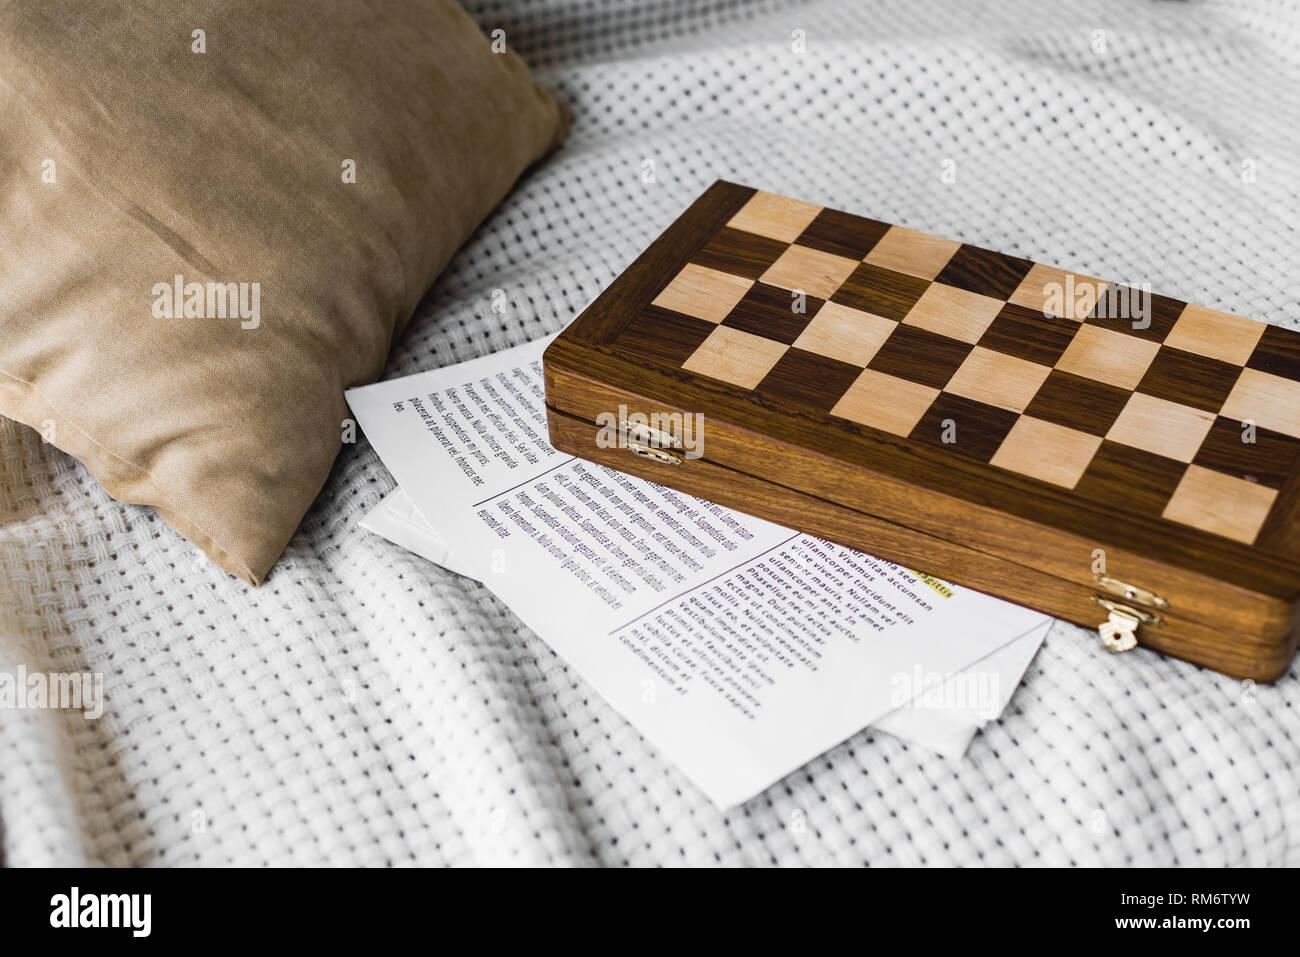 wooden chess board near newspaper on sofa Stock Photo